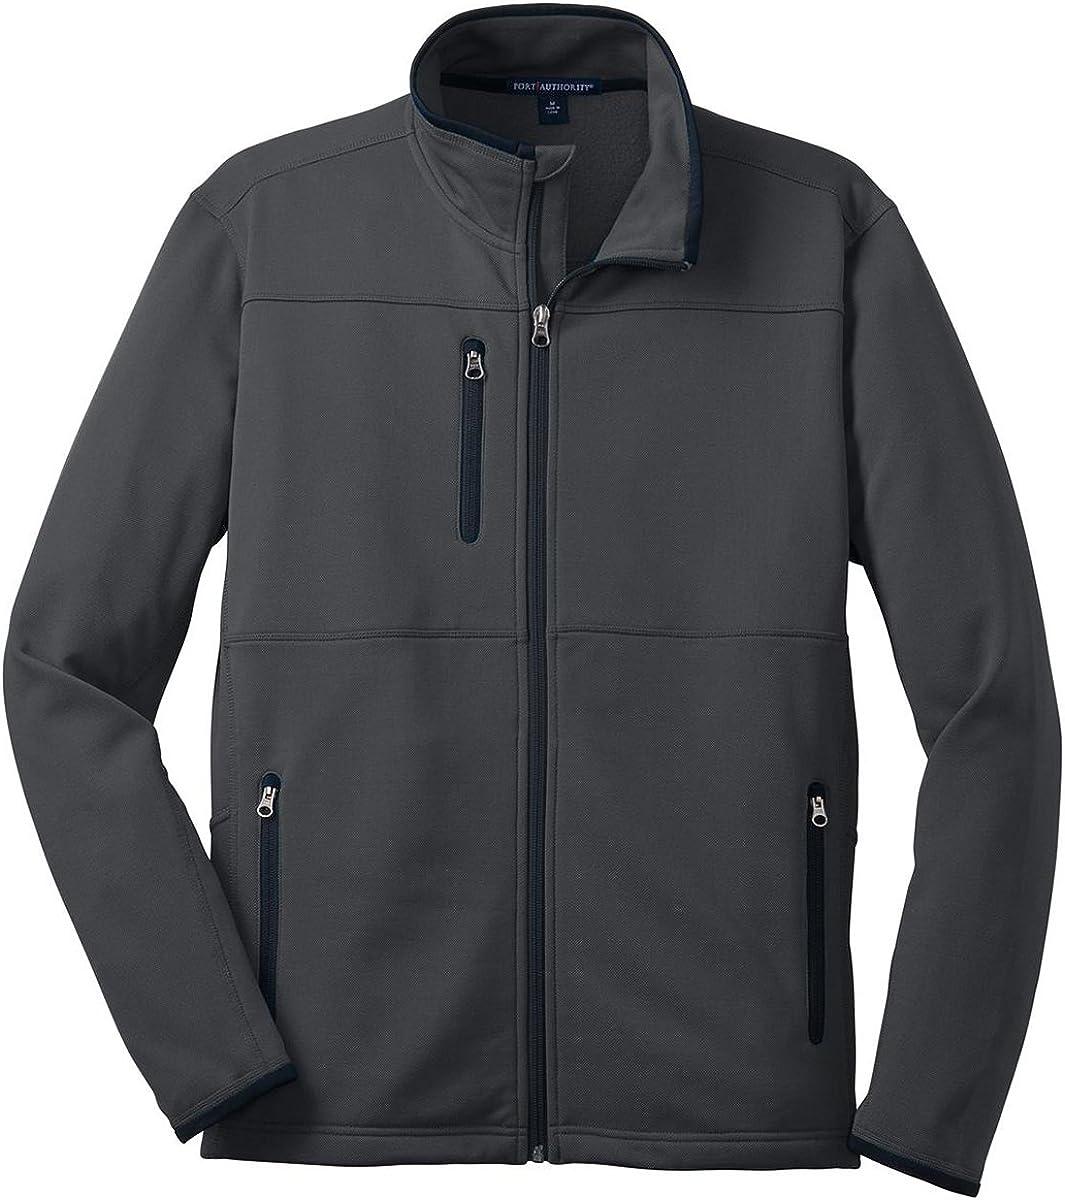 Port Authority F222 Pique Fleece Jacket - Graphite - 4XL